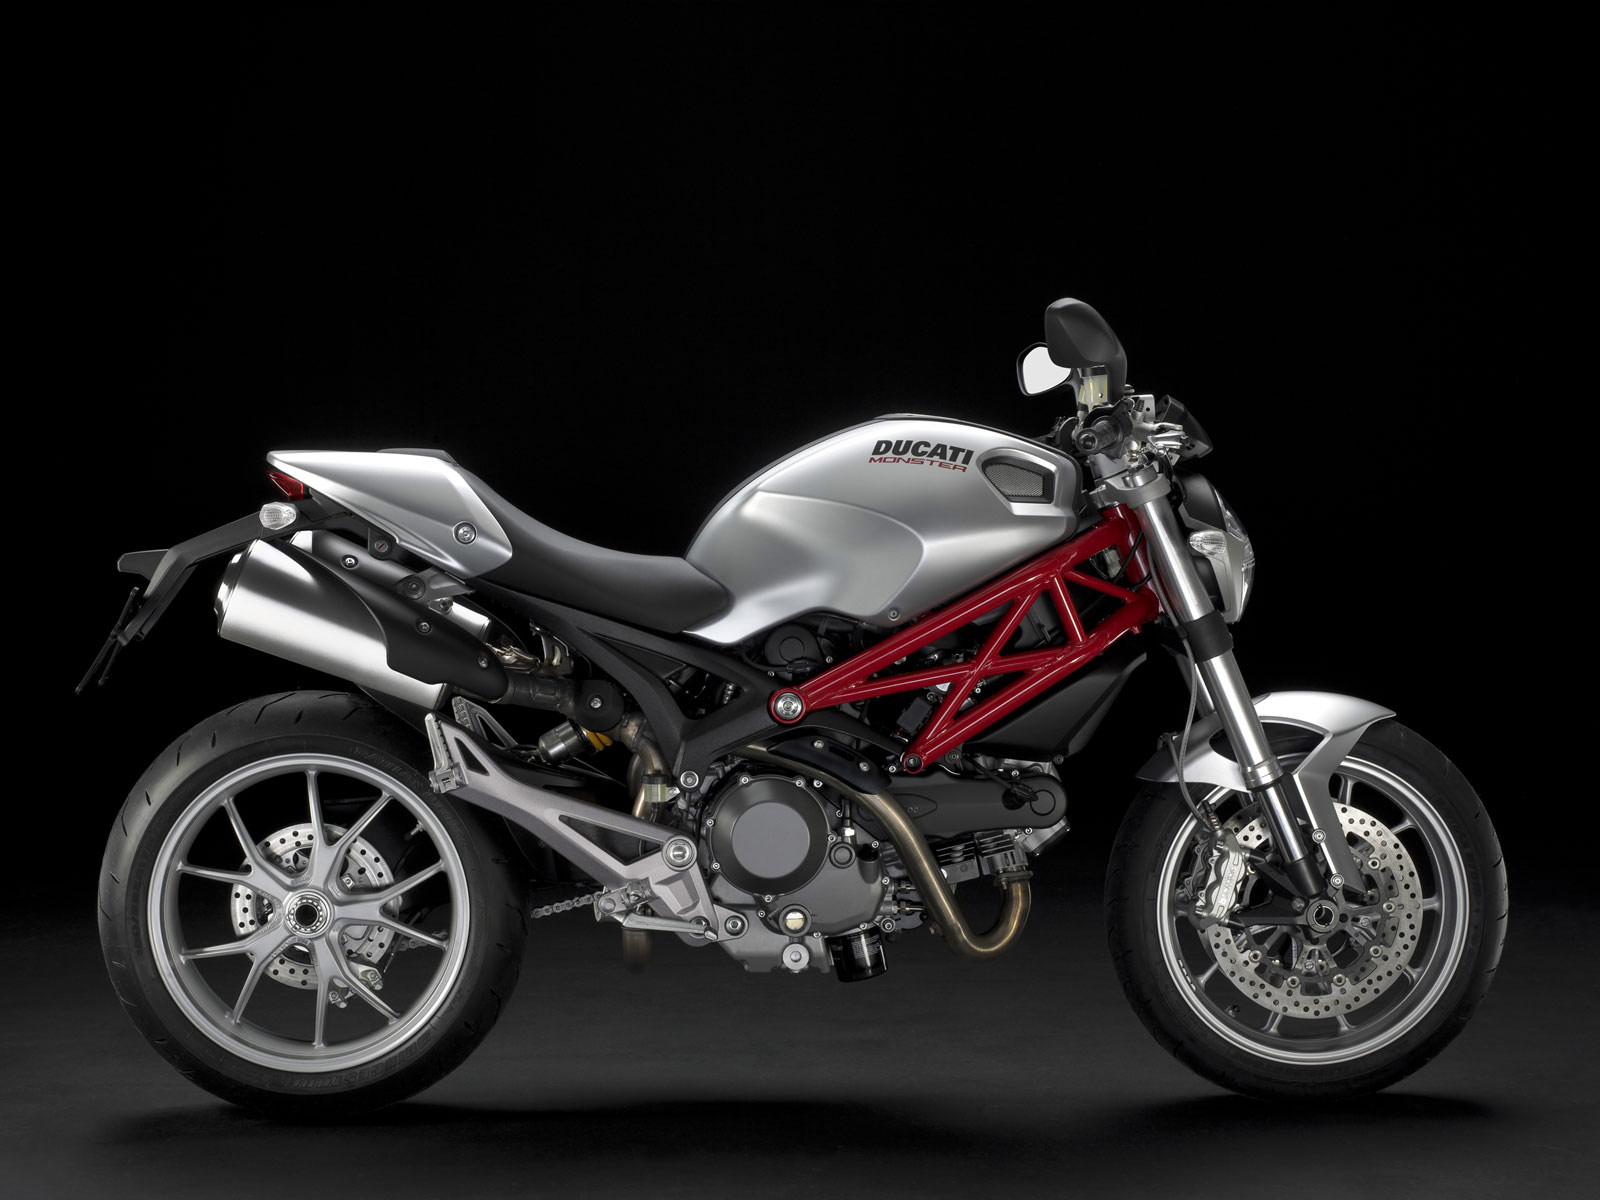 http://2.bp.blogspot.com/_ja0nvj5Jato/S6rn8D2ppJI/AAAAAAAAFig/ZiFPrRpCKQs/s1600/Ducati-Monster1100_2010_2.jpg